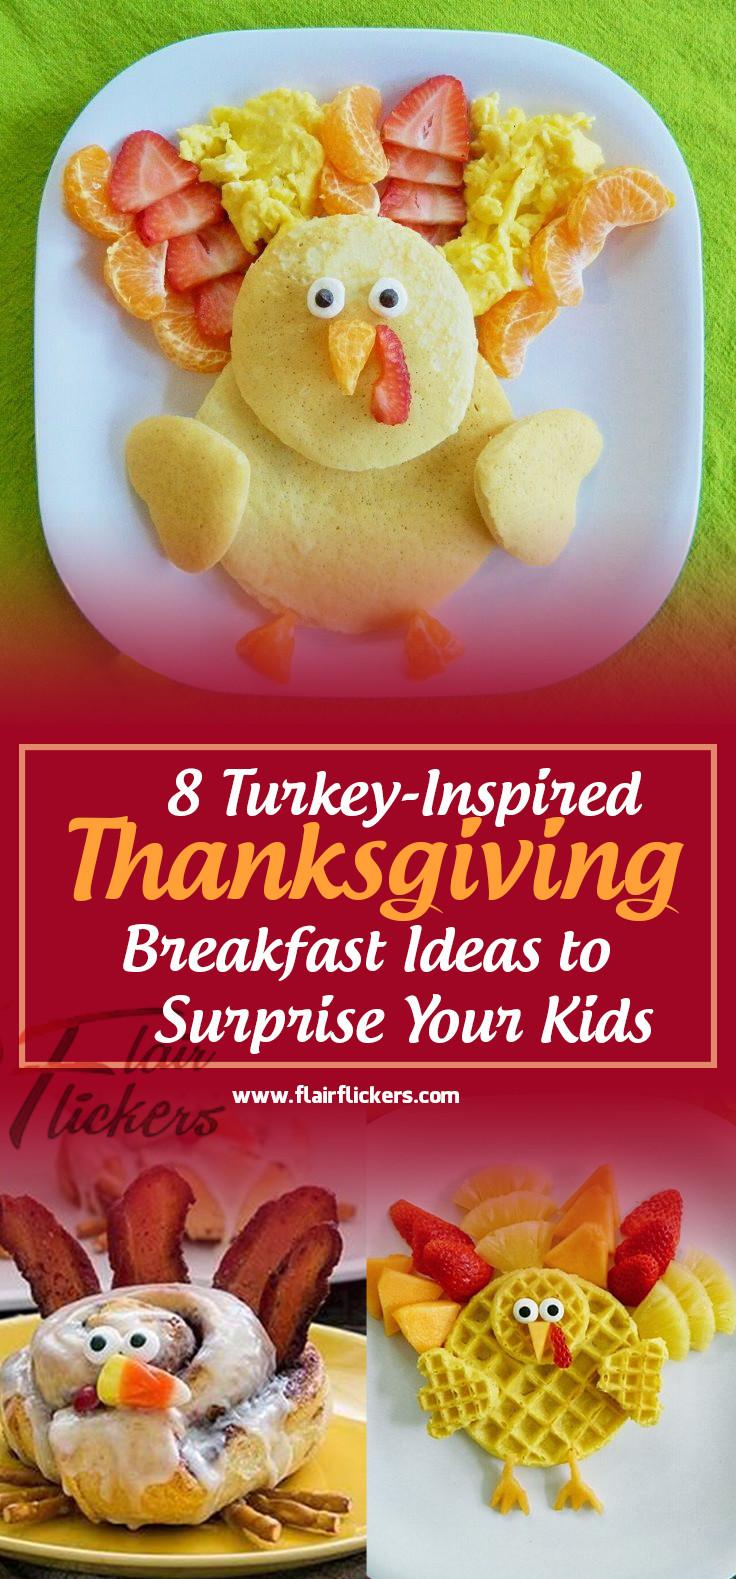 Thanksgiving Breakfast Ideas  8 Turkey Inspired Thanksgiving Breakfast Ideas to Surprise